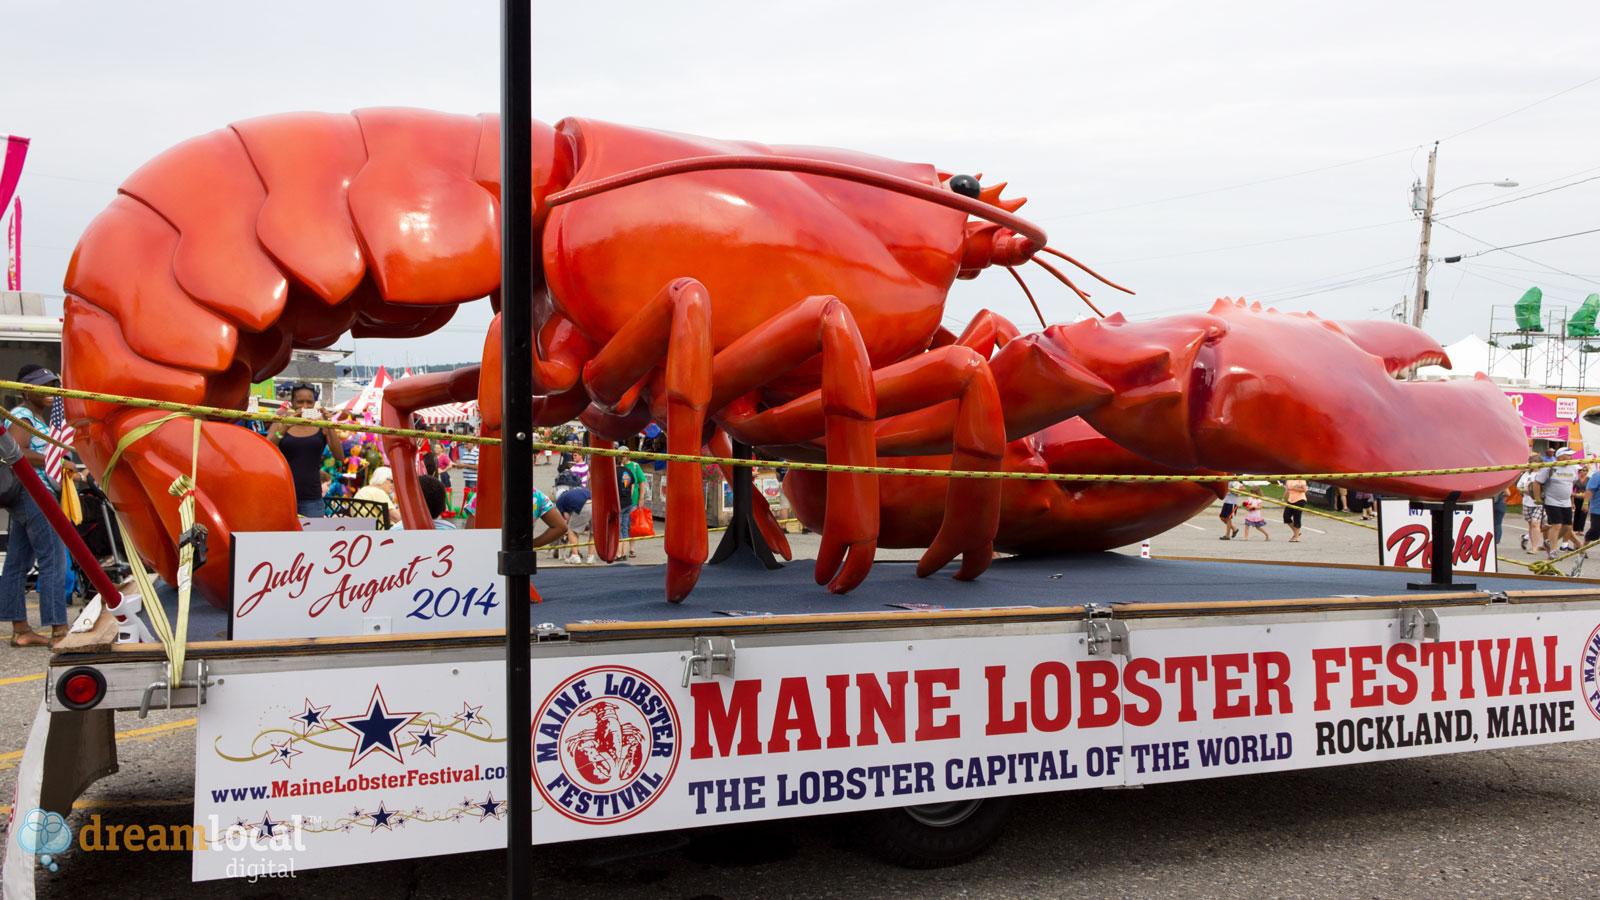 Aragosta Lobster food ricette Maine lobster roll Catalona Festival cucina